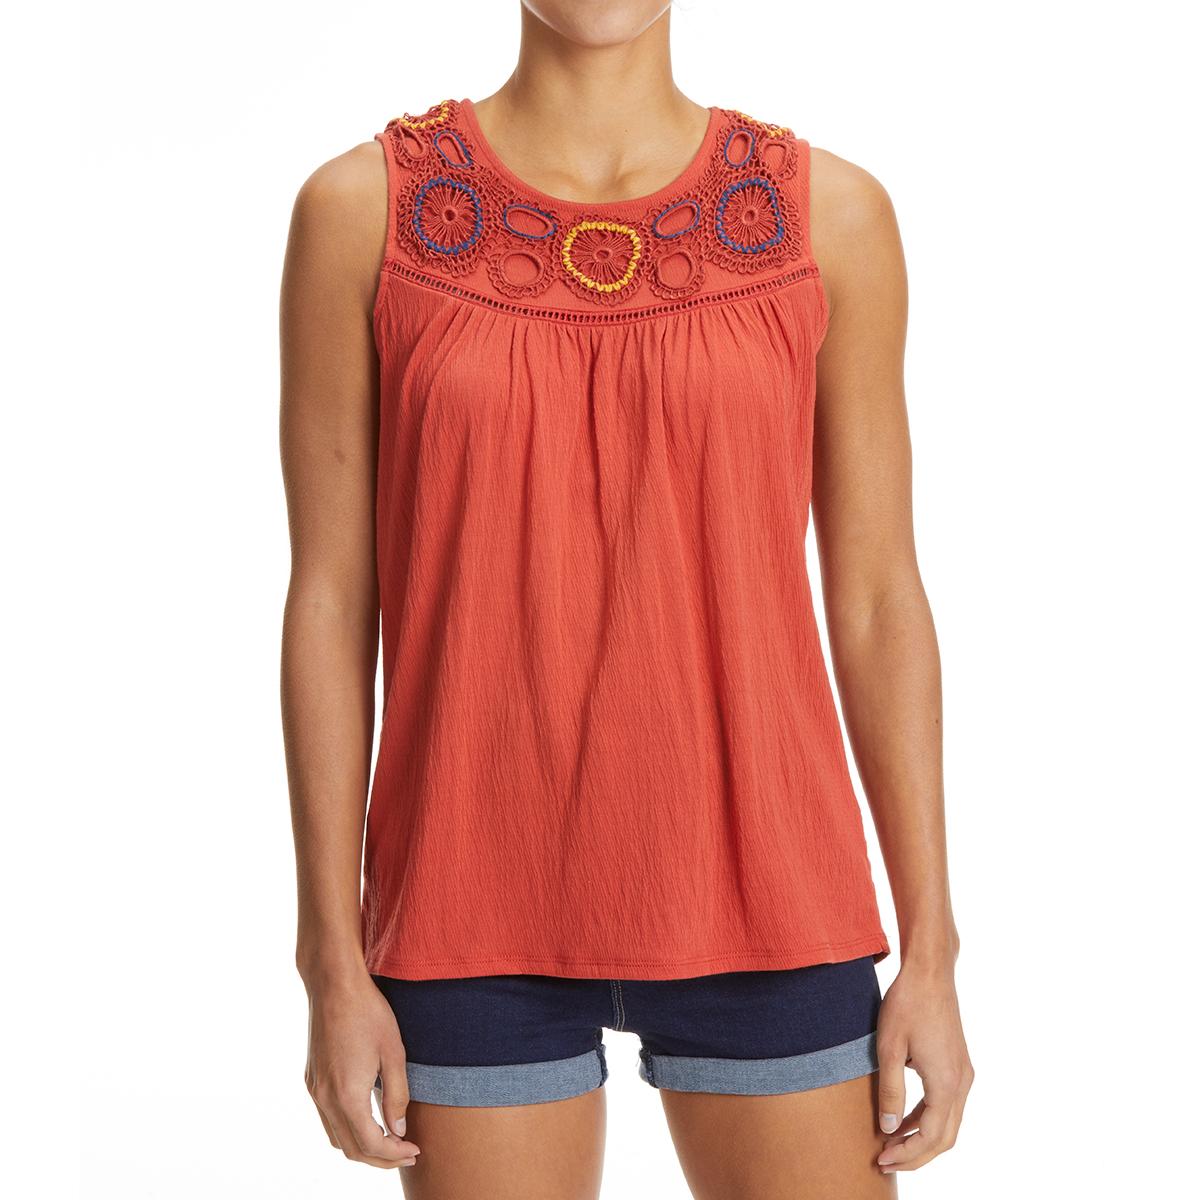 Absolutely Famous Crochet Front Tank Top - Orange, L